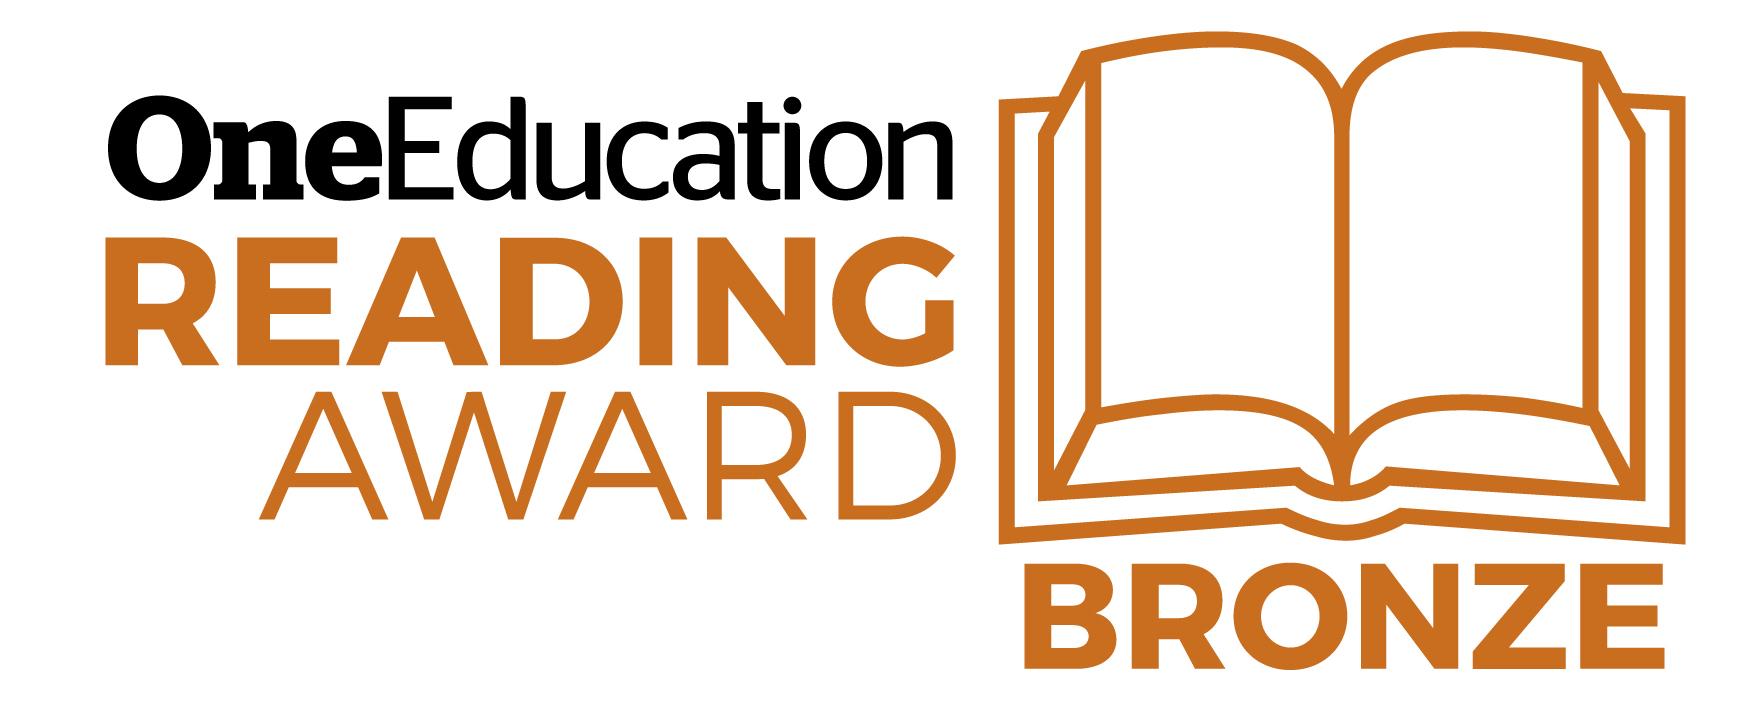 Reading award logo BRONZE.jpg